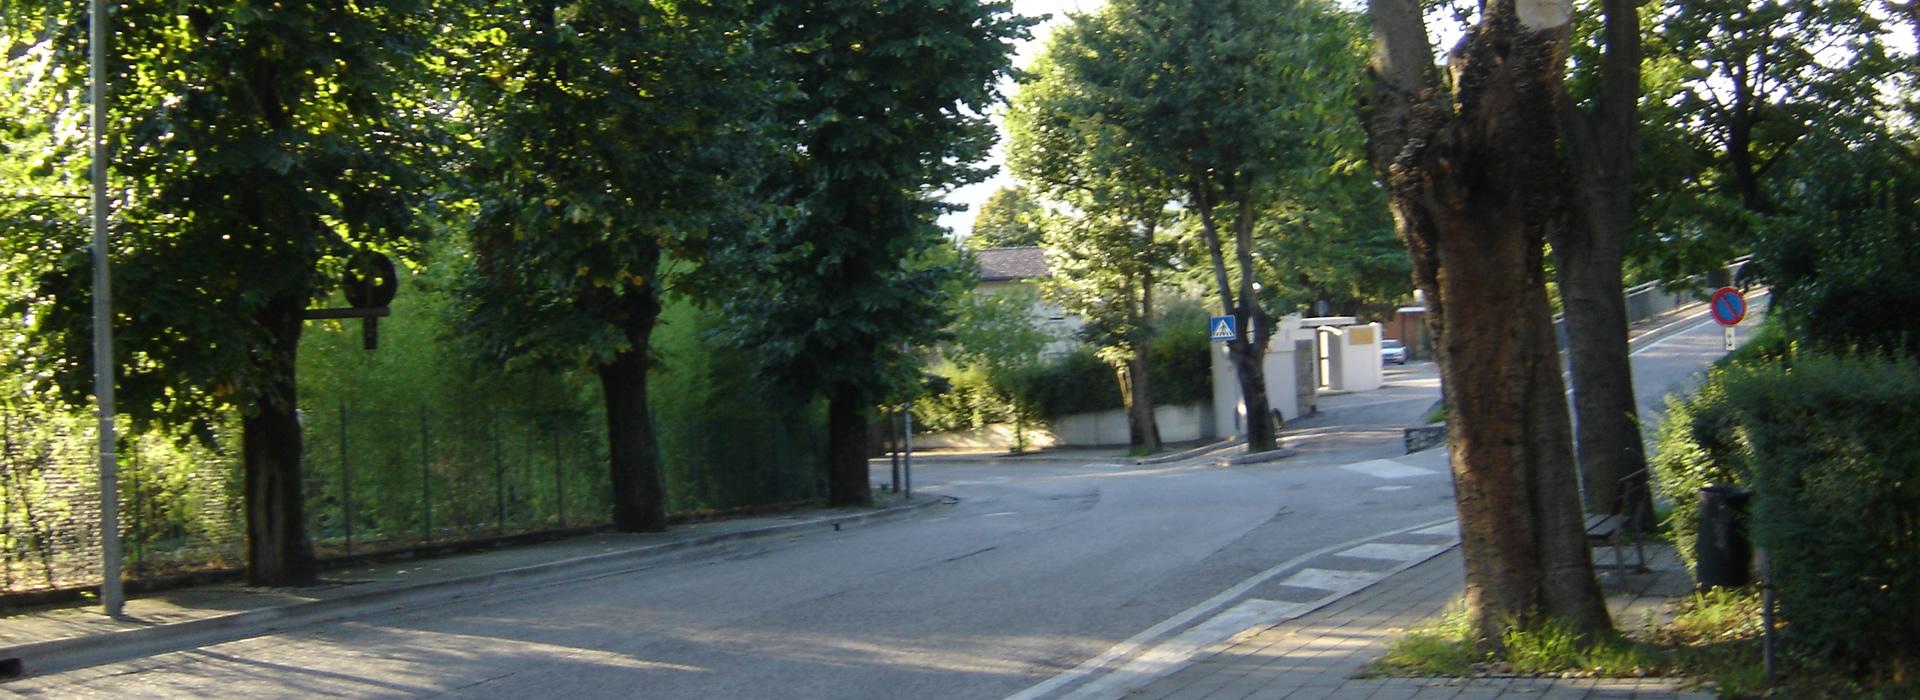 strada-roma